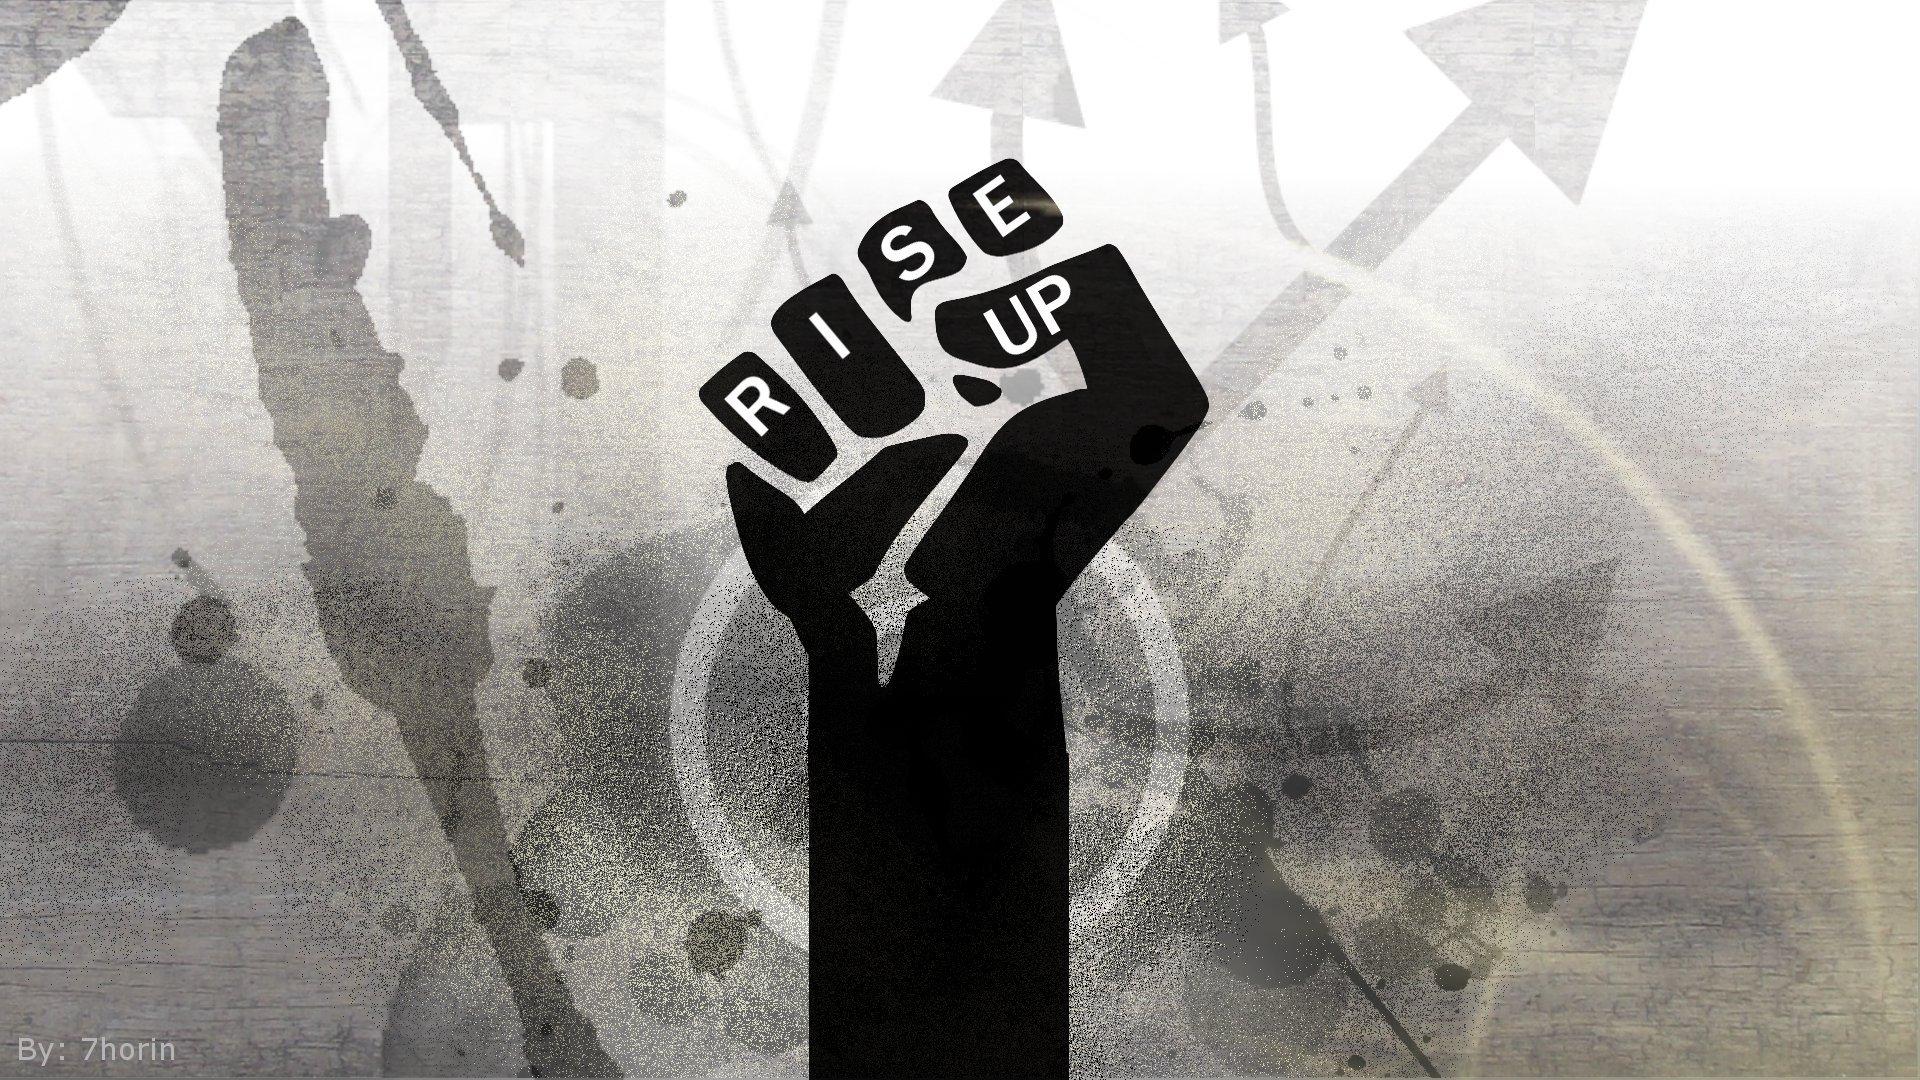 Riseup lanza genial concurso aniversario